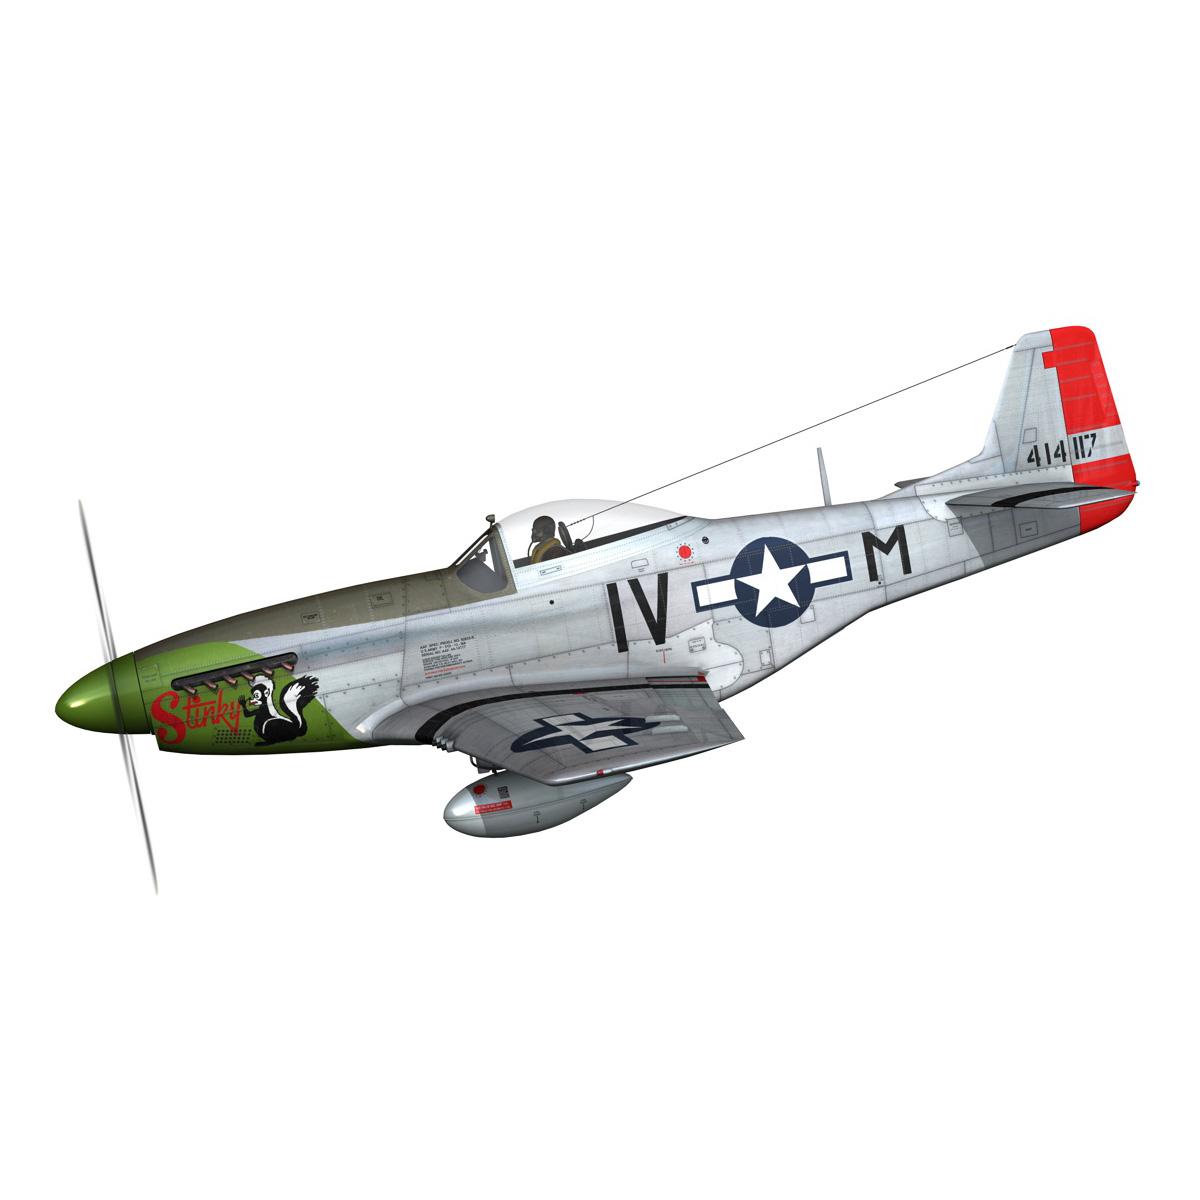 north american p-51d mustang – stinky 3d model fbx c4d lwo obj 269596